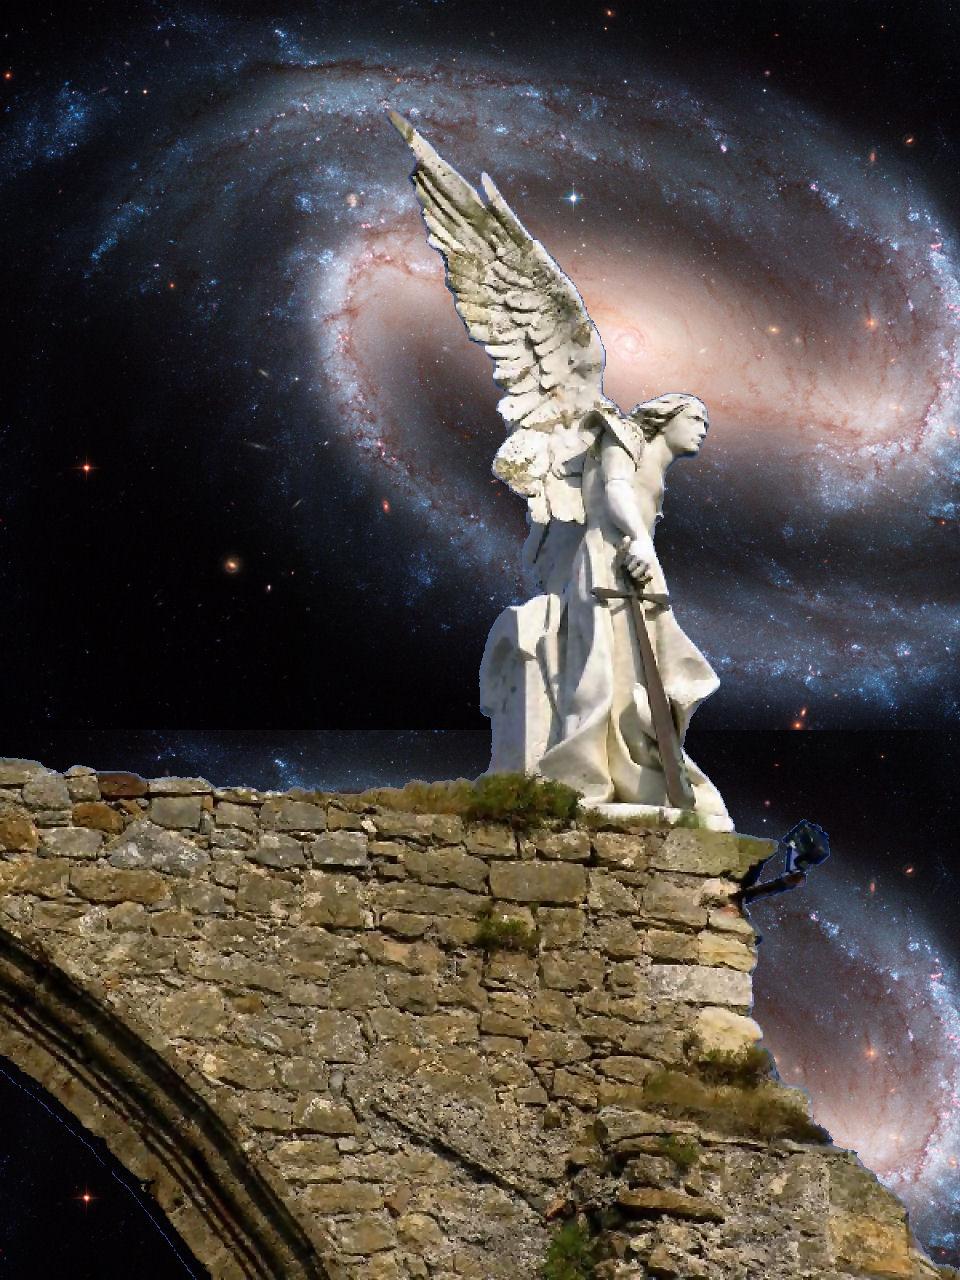 Primeiro plano: anjo em Comillas, Espanha. Fundo: Barred Spiral Galaxy NGC 1300, NASA.